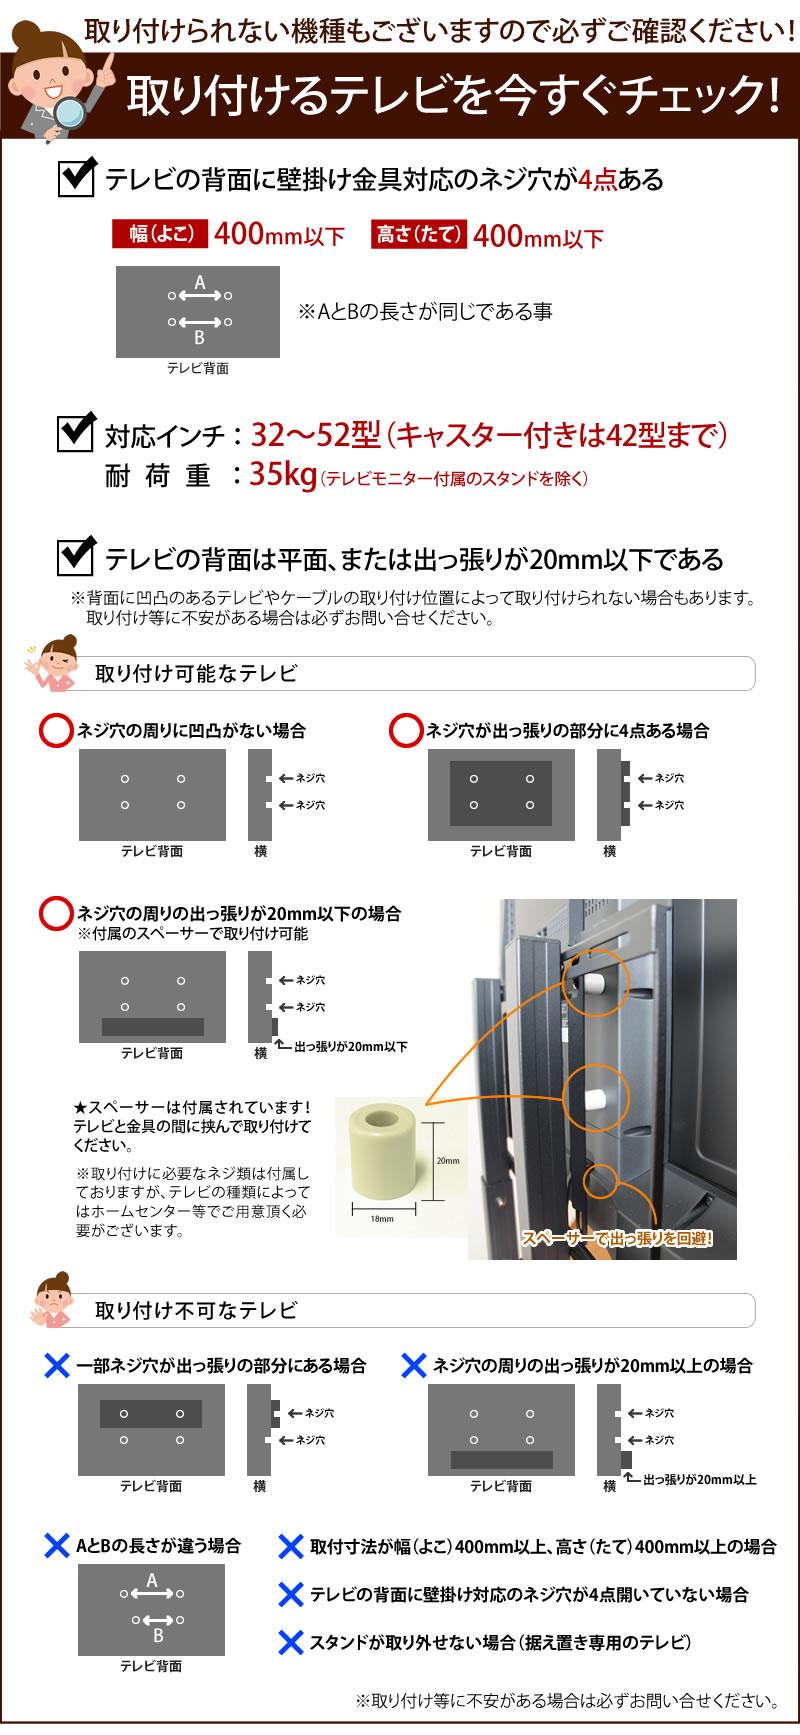 ocf_450_3_check.jpg